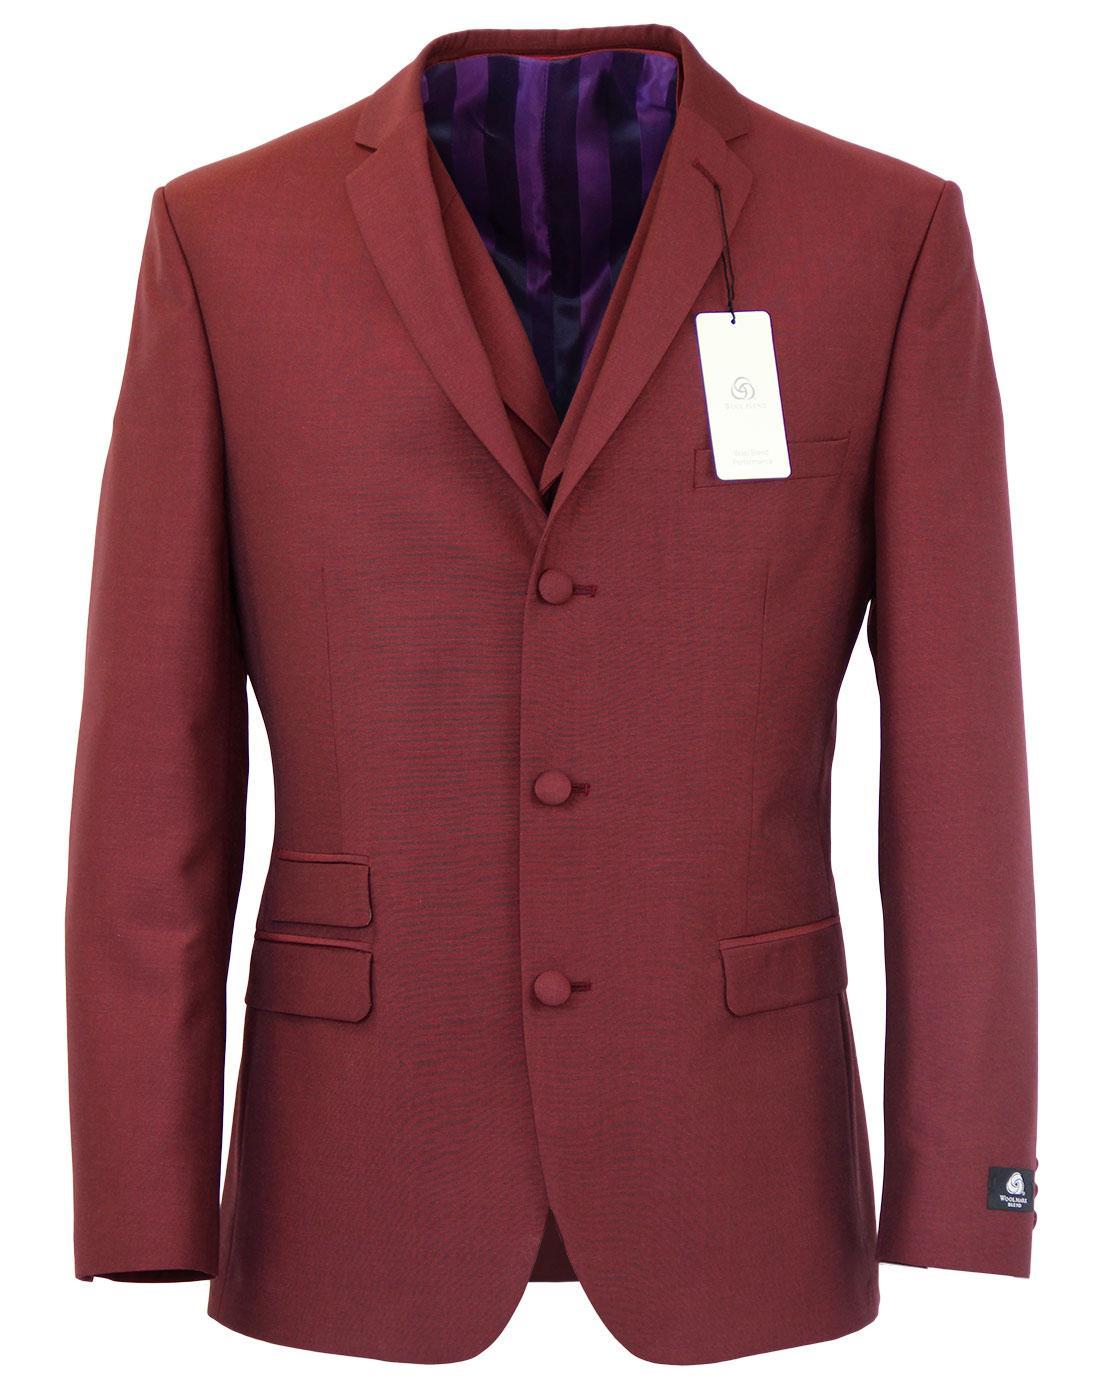 Madcap England Mohair Tonic Suit Jacket